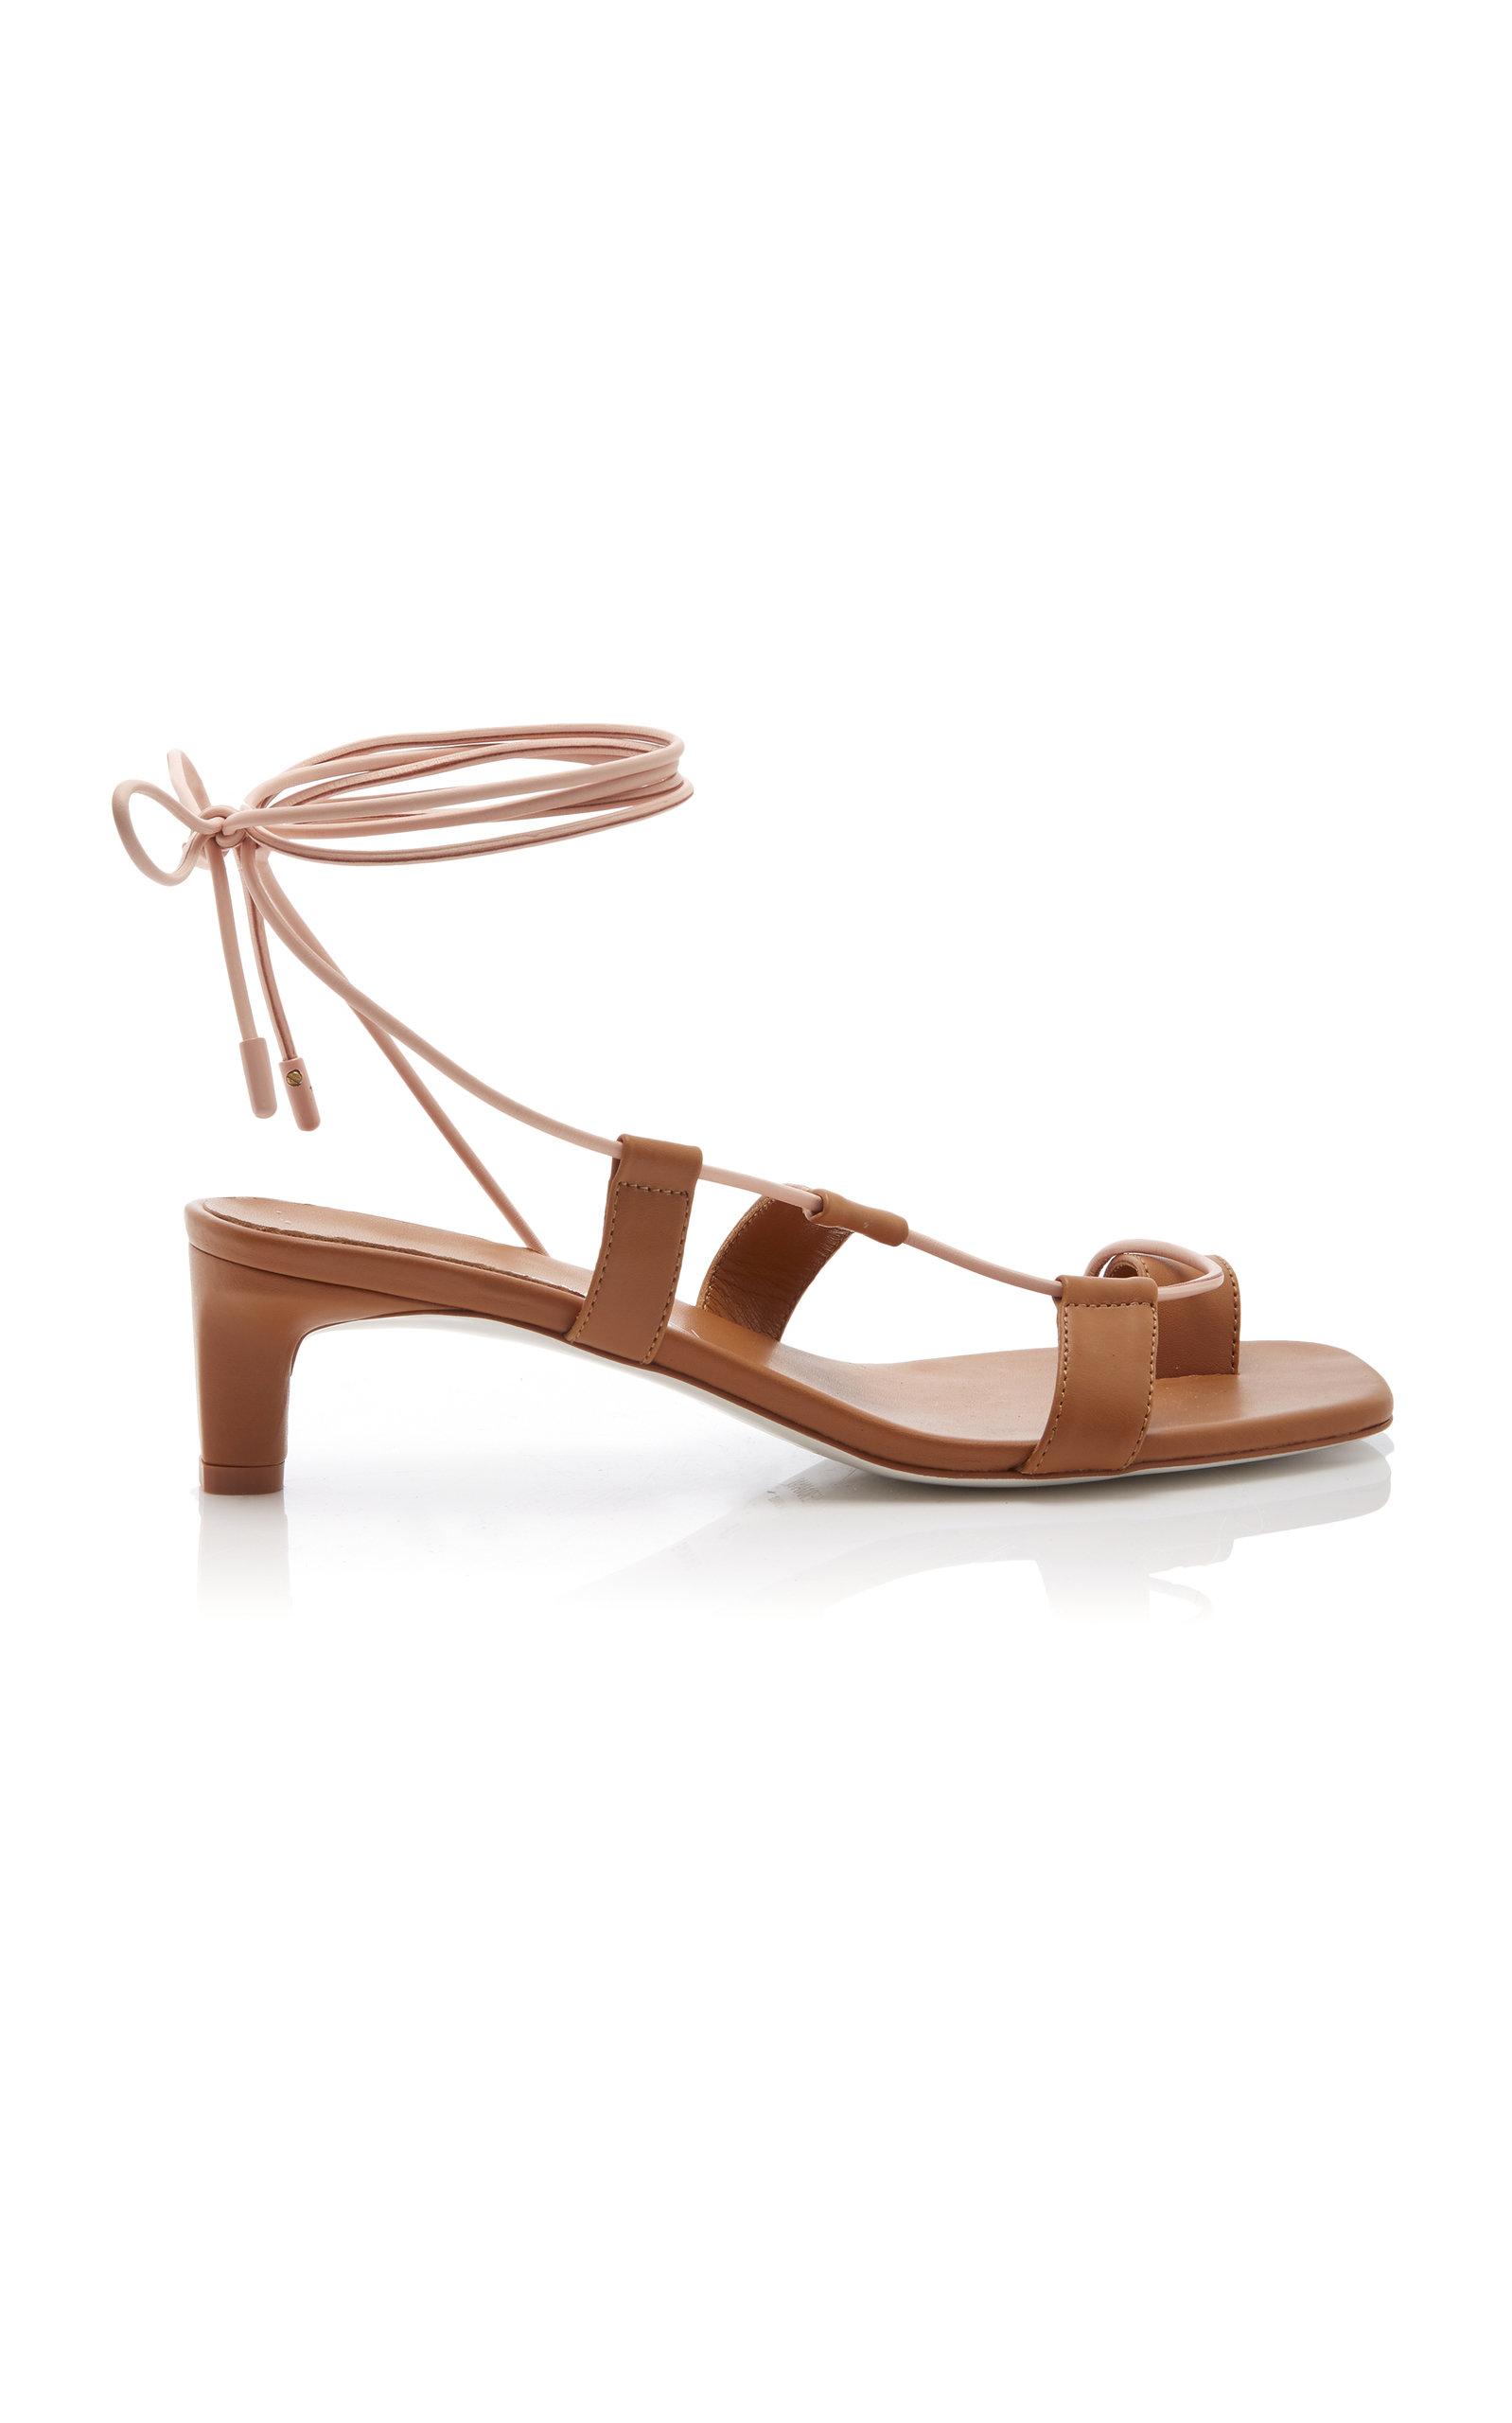 dc1eaecc895 Zimmermann Kitten Sandal In Brown